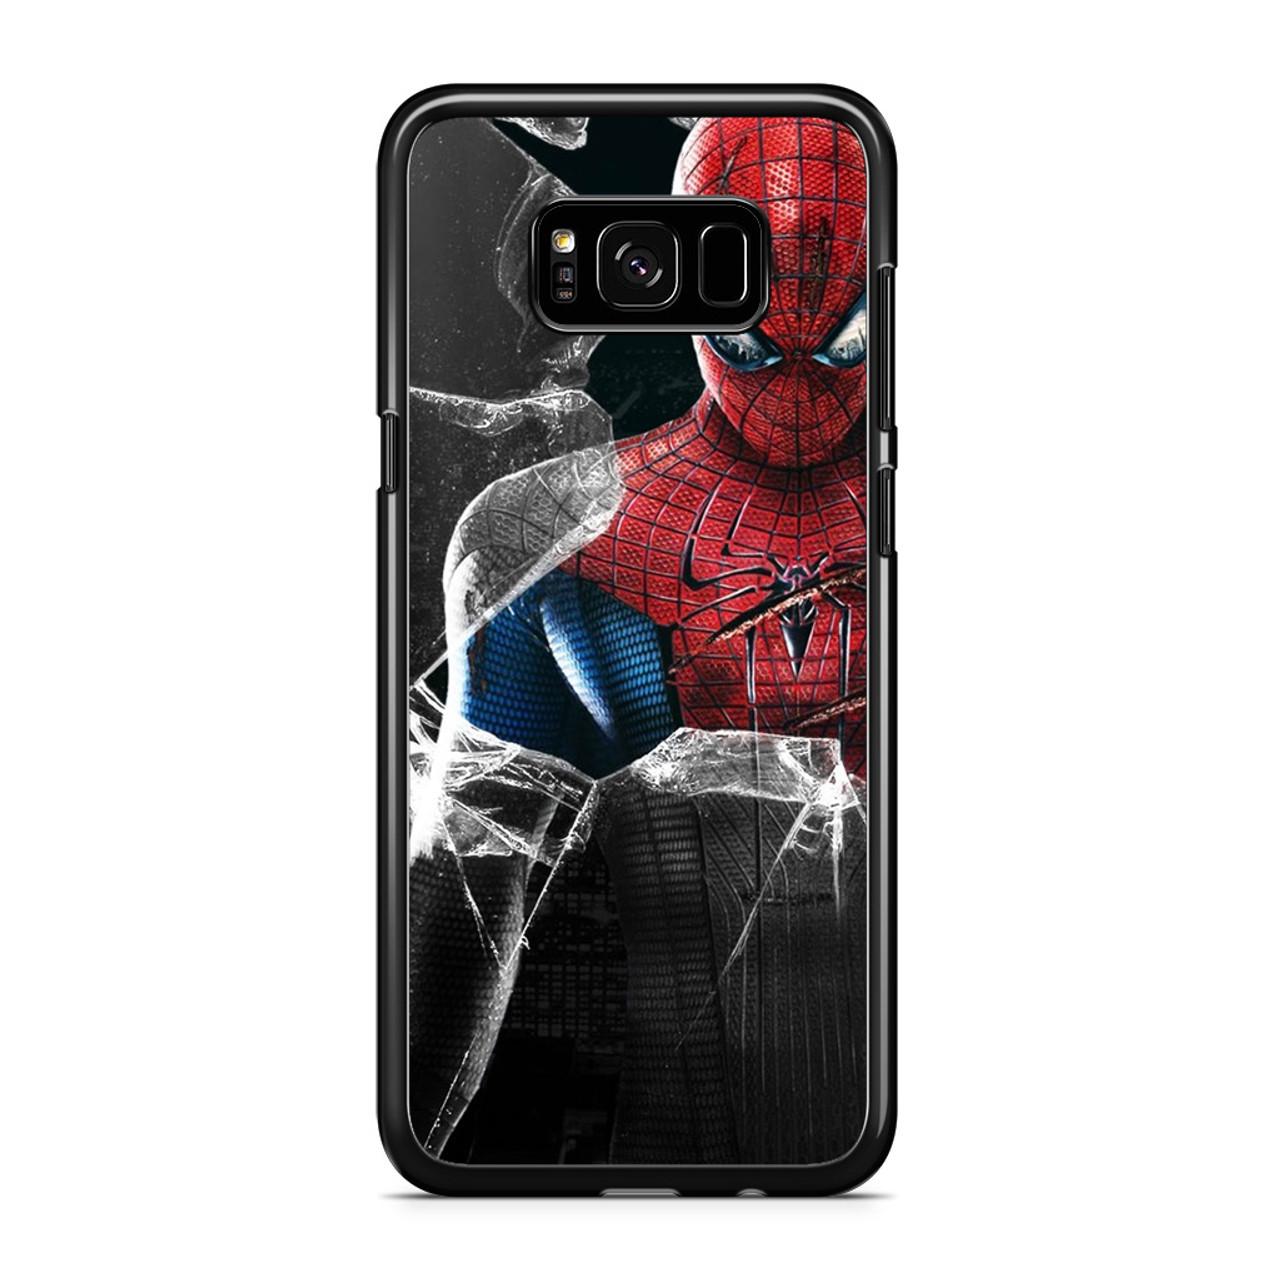 new arrival c6459 0c3c8 The Amazing Spiderman Samsung Galaxy S8 Case